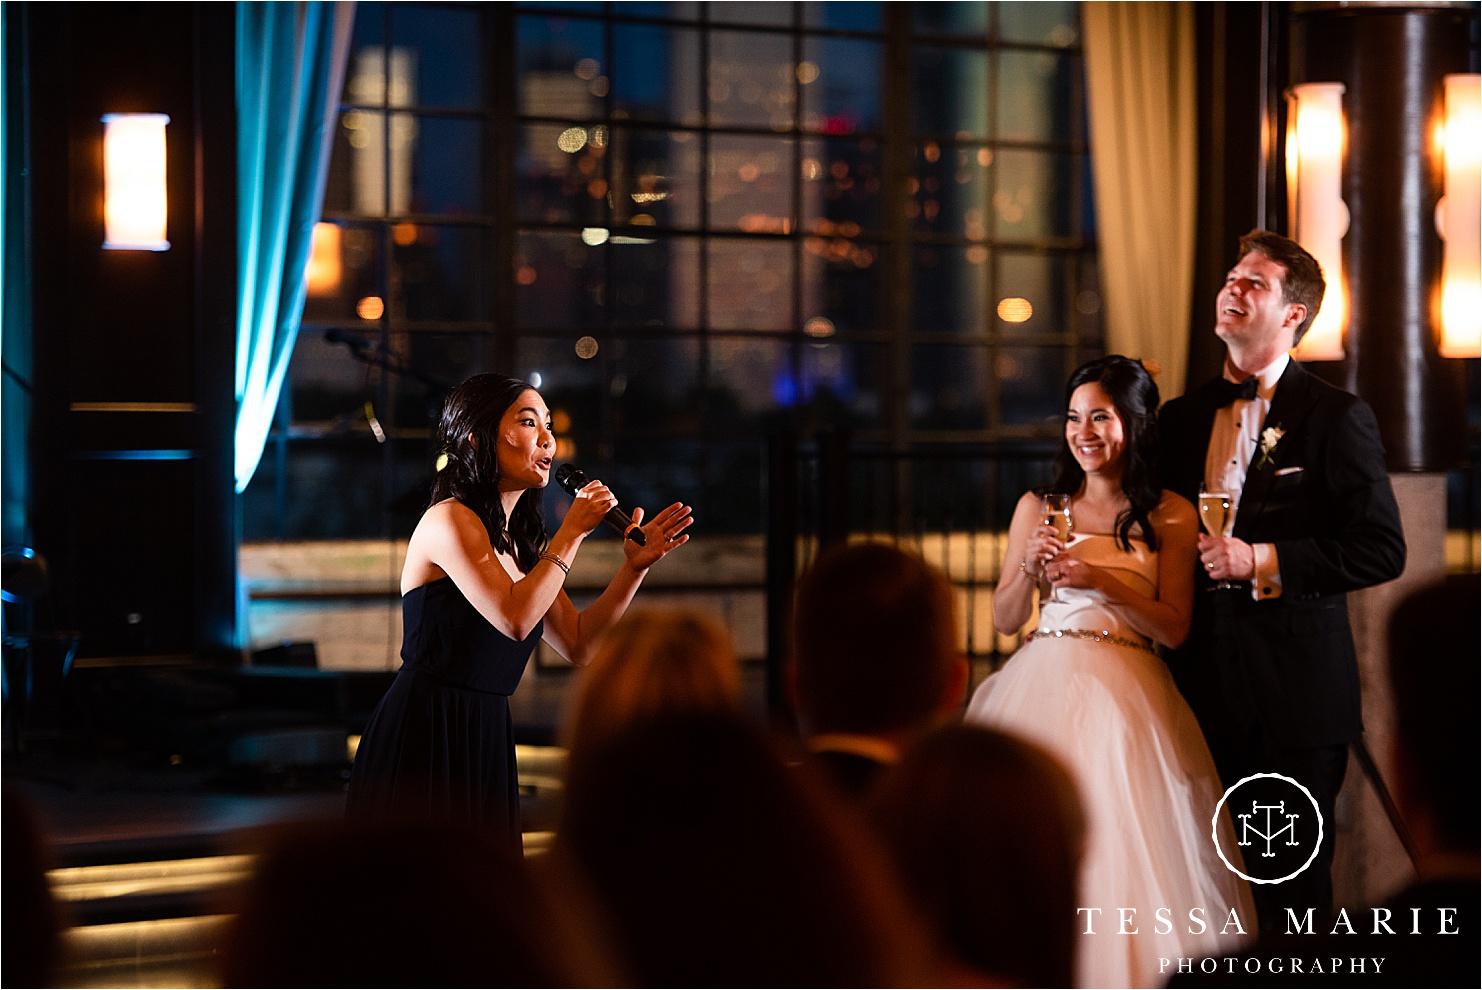 Tessa_marie_weddings_houston_wedding_photographer_The_astorian_0161.jpg